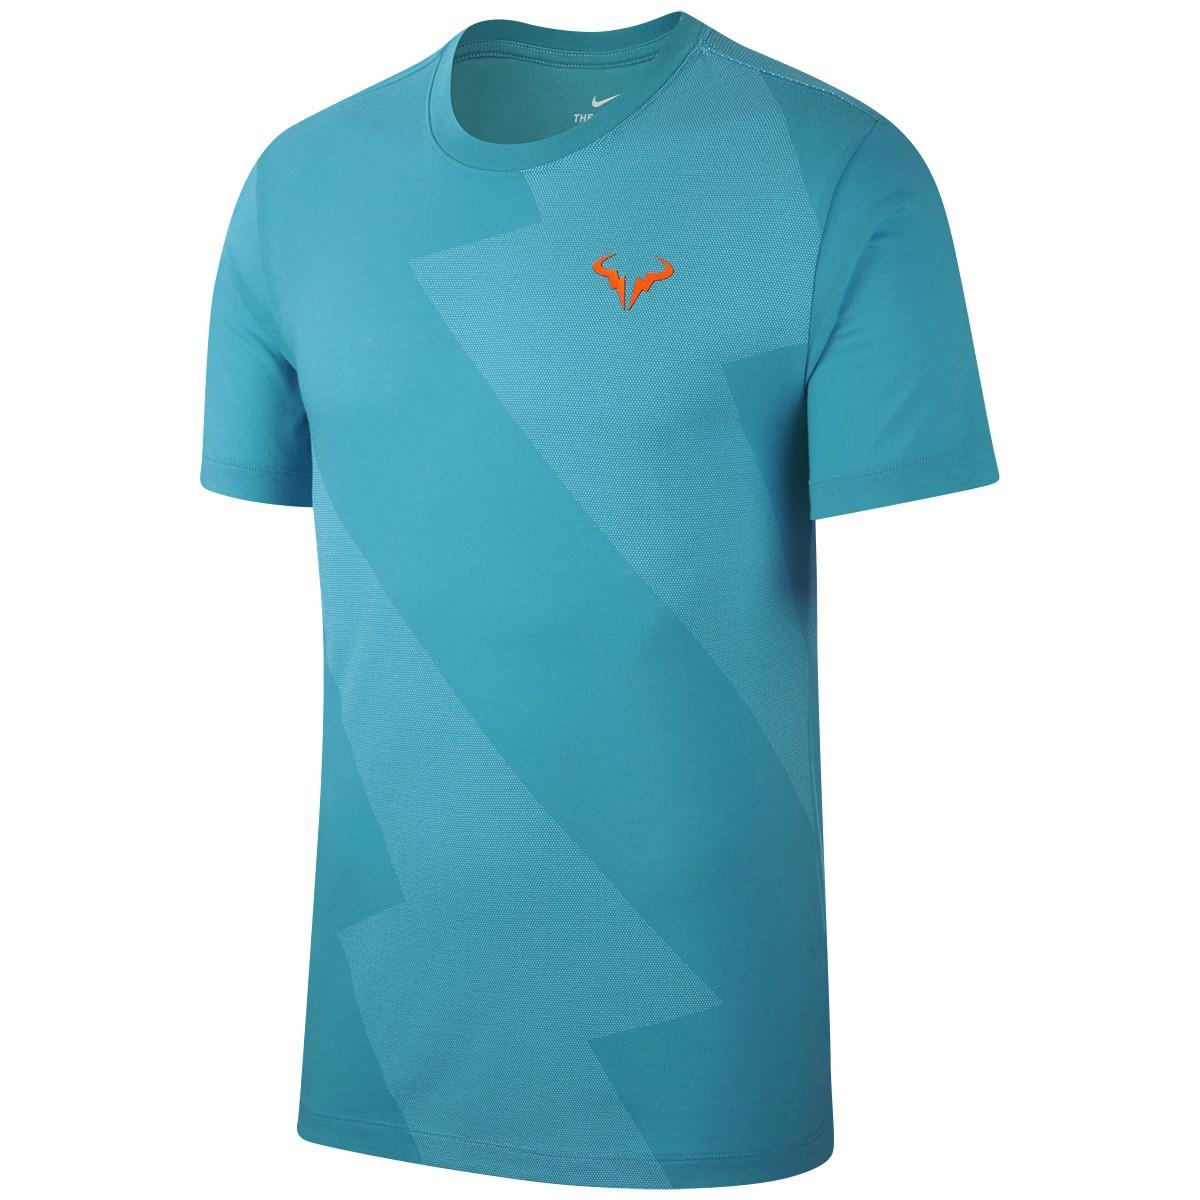 Court Hombre RopaTennispro Rafa Camiseta Nike sCxrBQthdo